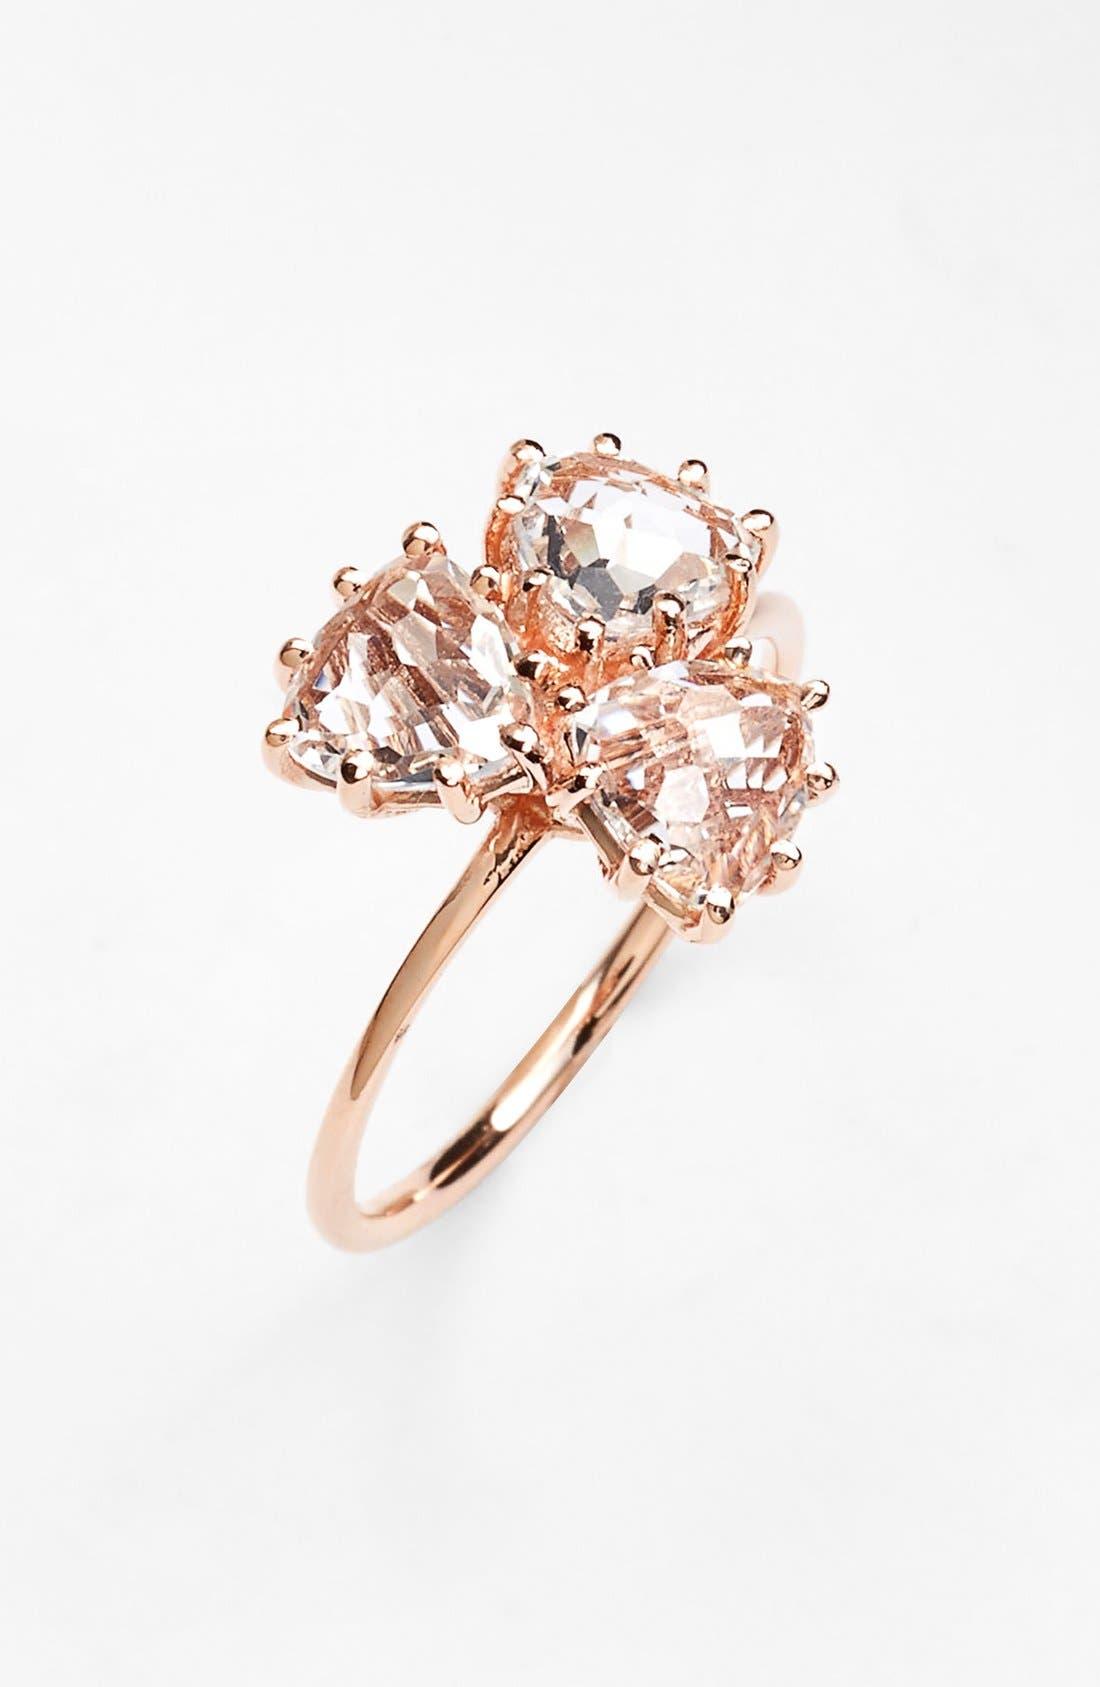 KALAN by Suzanne Kalan Triple Trillion Stone Ring,                             Main thumbnail 1, color,                             Rose Gold/ White Topaz